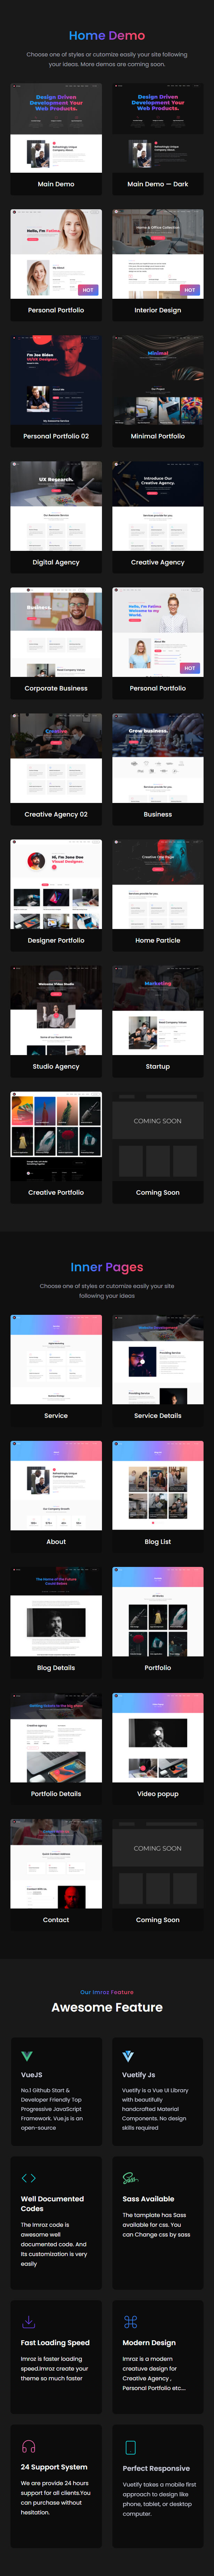 Imroz - Creative Agency & Portfolio VueJS Template - 8